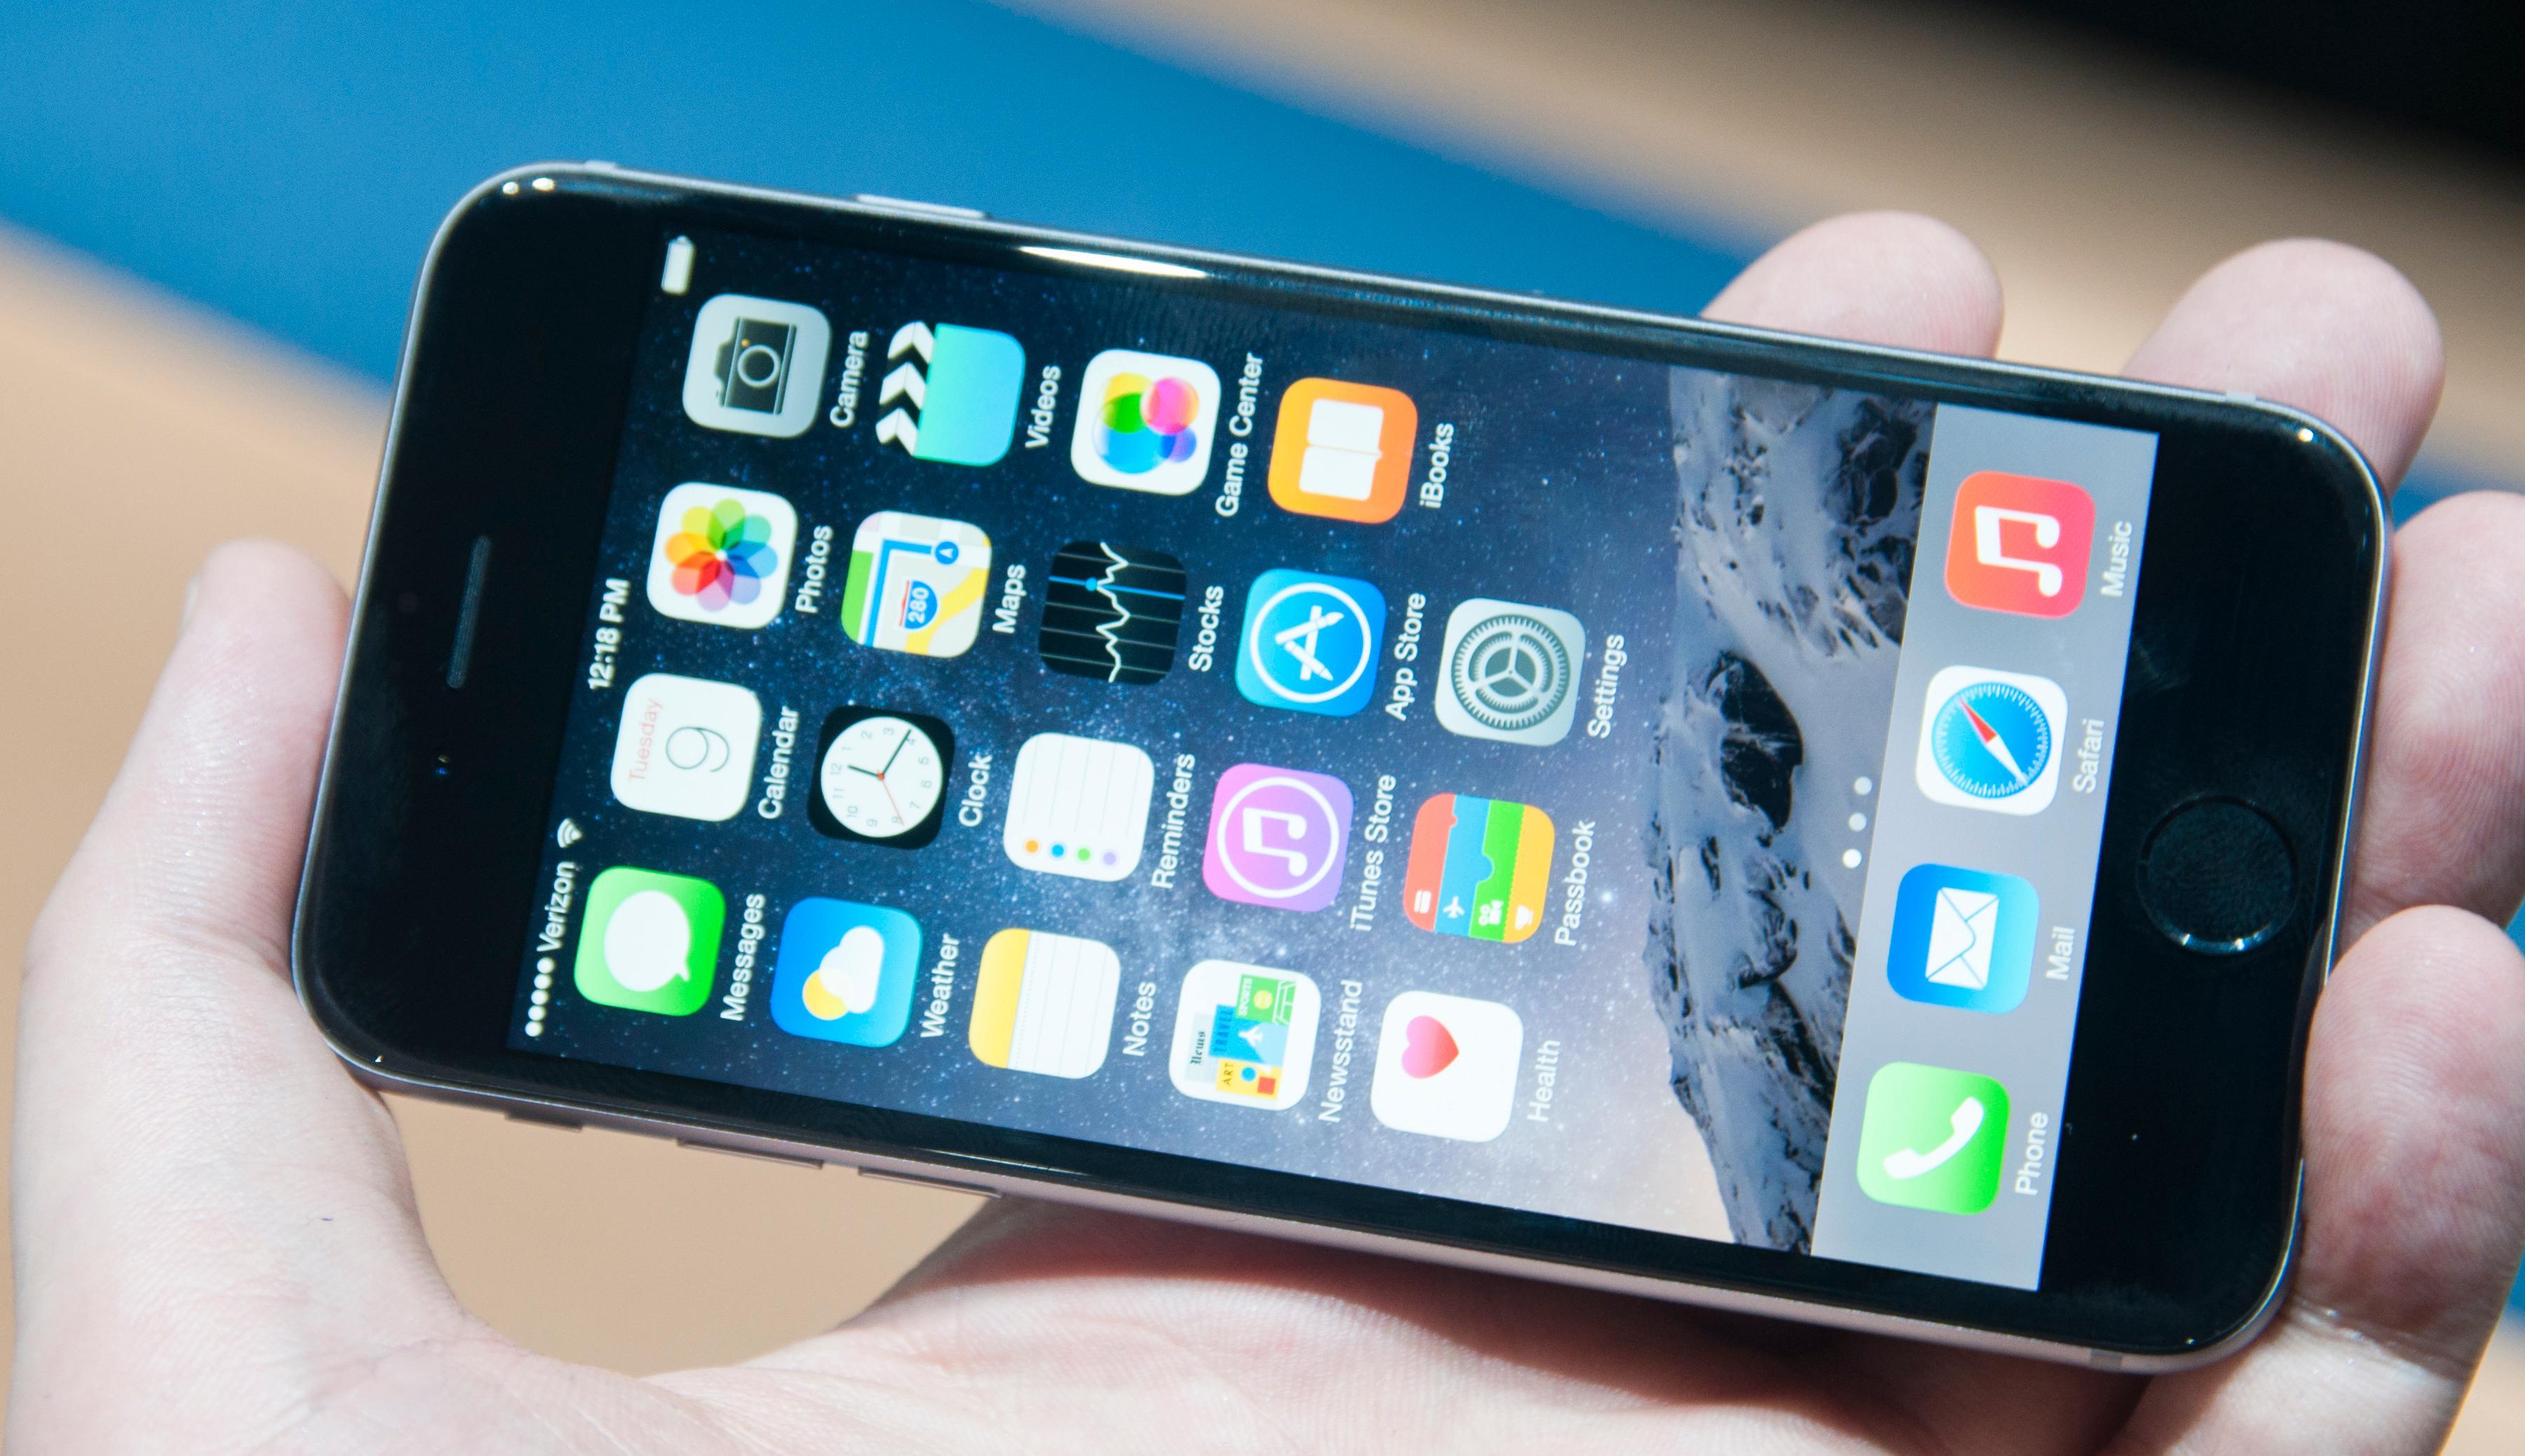 iPhone 6 topper NetComs liste over de mest solgte telefonene i oktober, mens den er helt nede på en 7. plass hos Elkjøp.Foto: Finn Jarle Kvalheim, Amobil.no